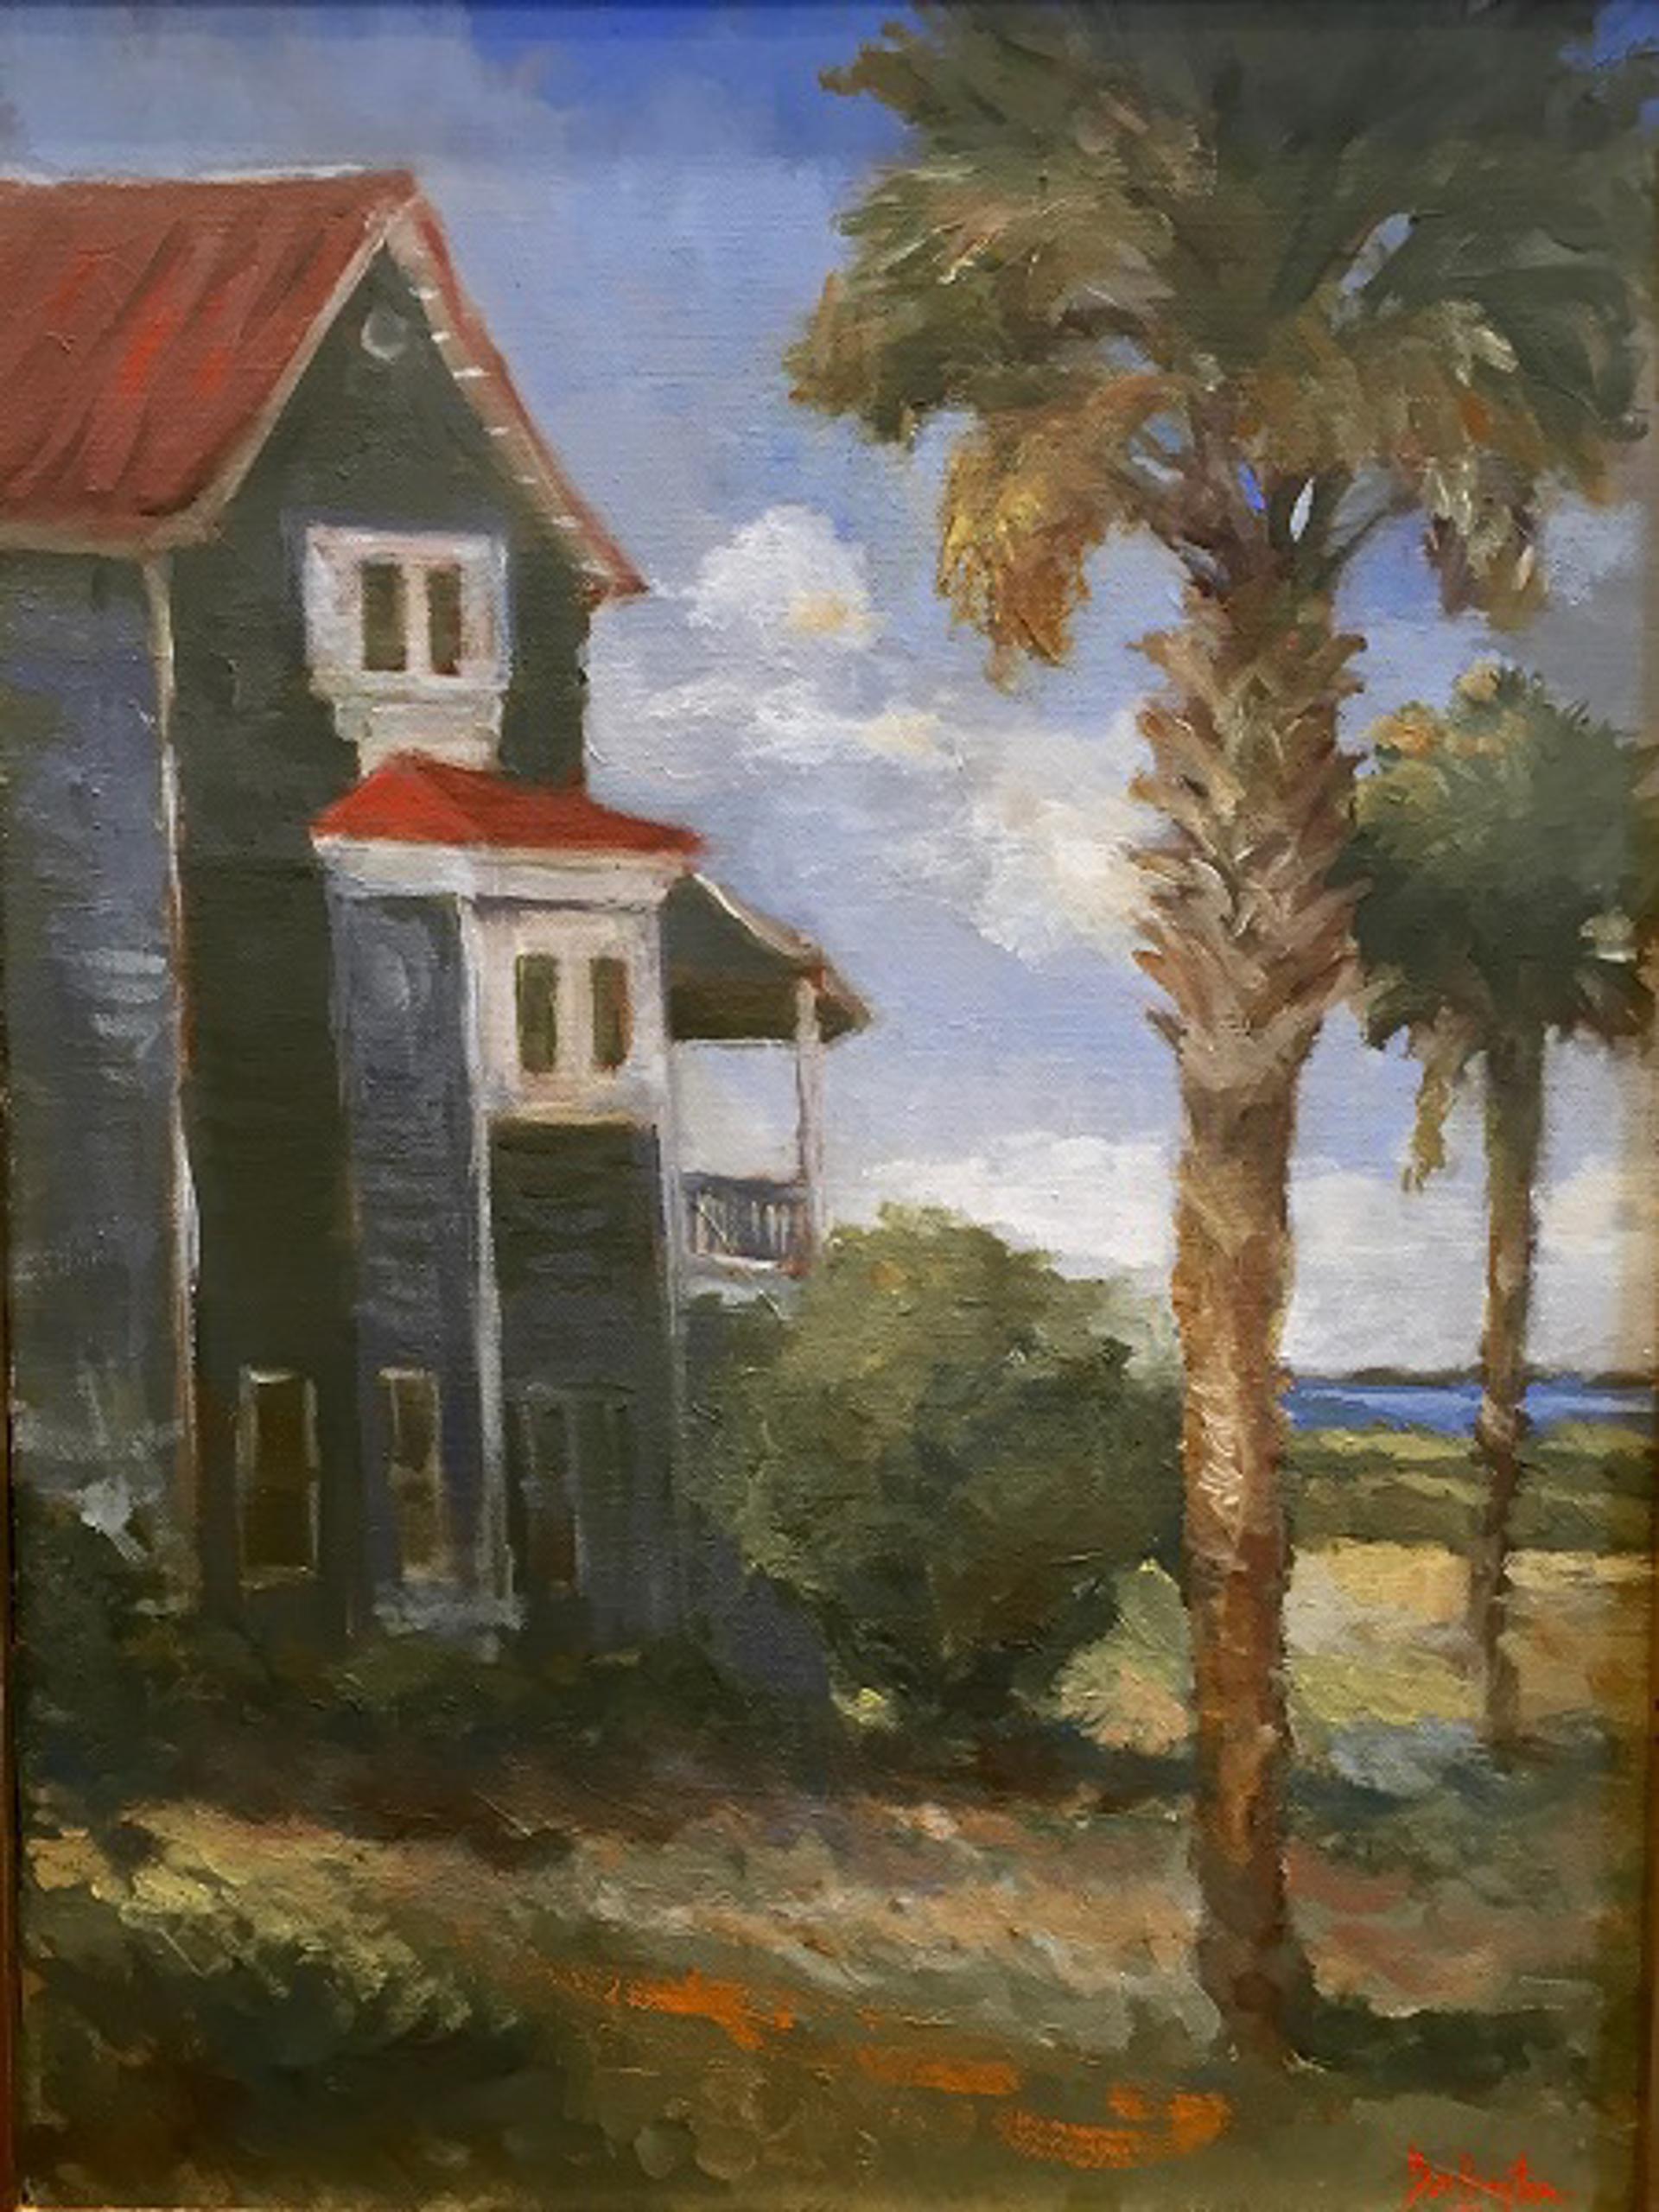 Porpoise Point and Palmettos by Jim Darlington